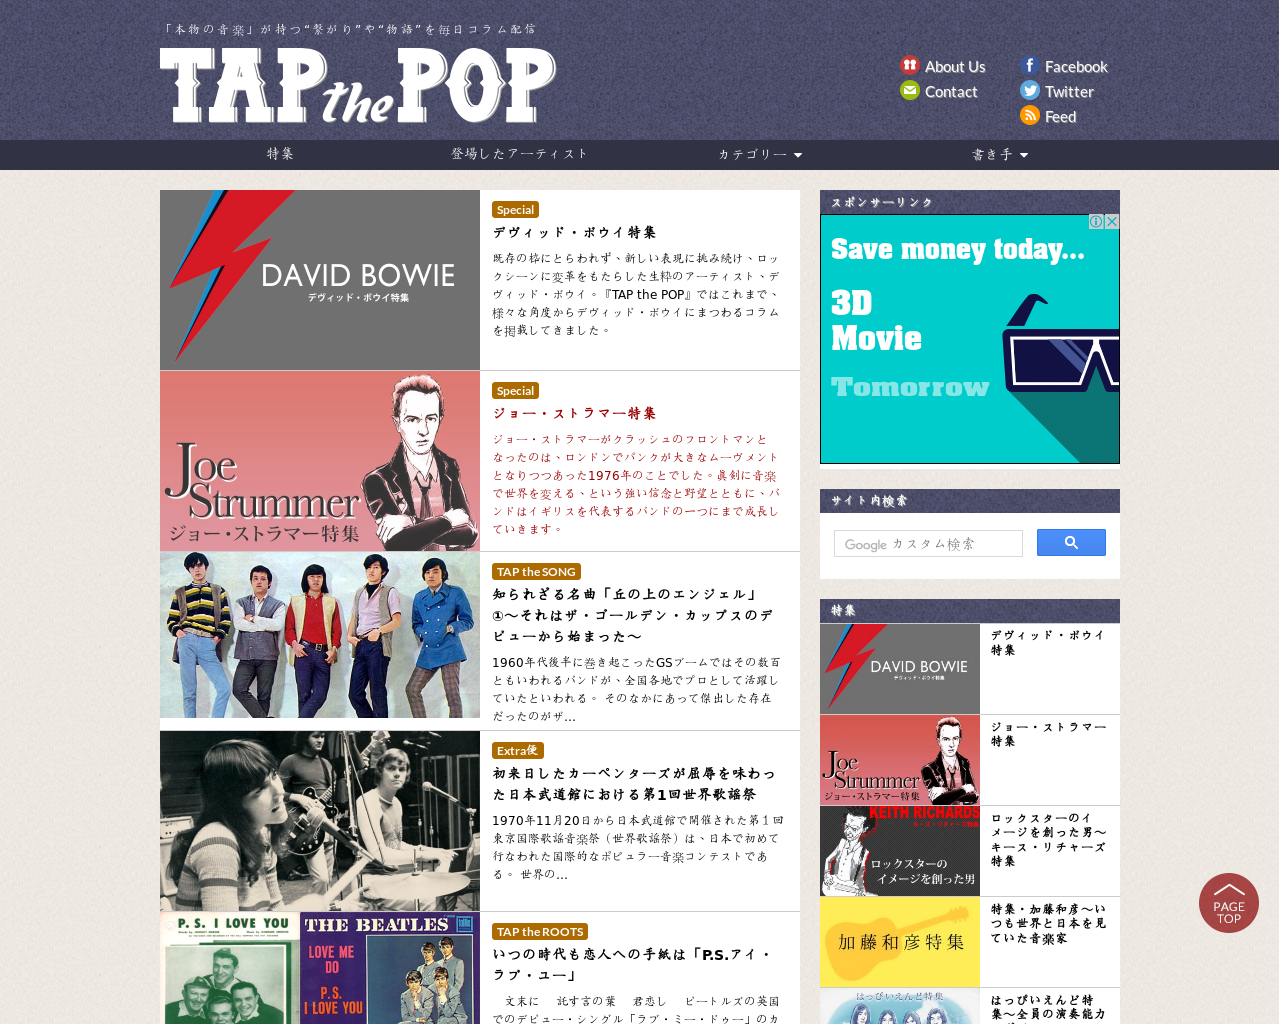 www.tapthepop.net(2018/01/12 22:52:11)